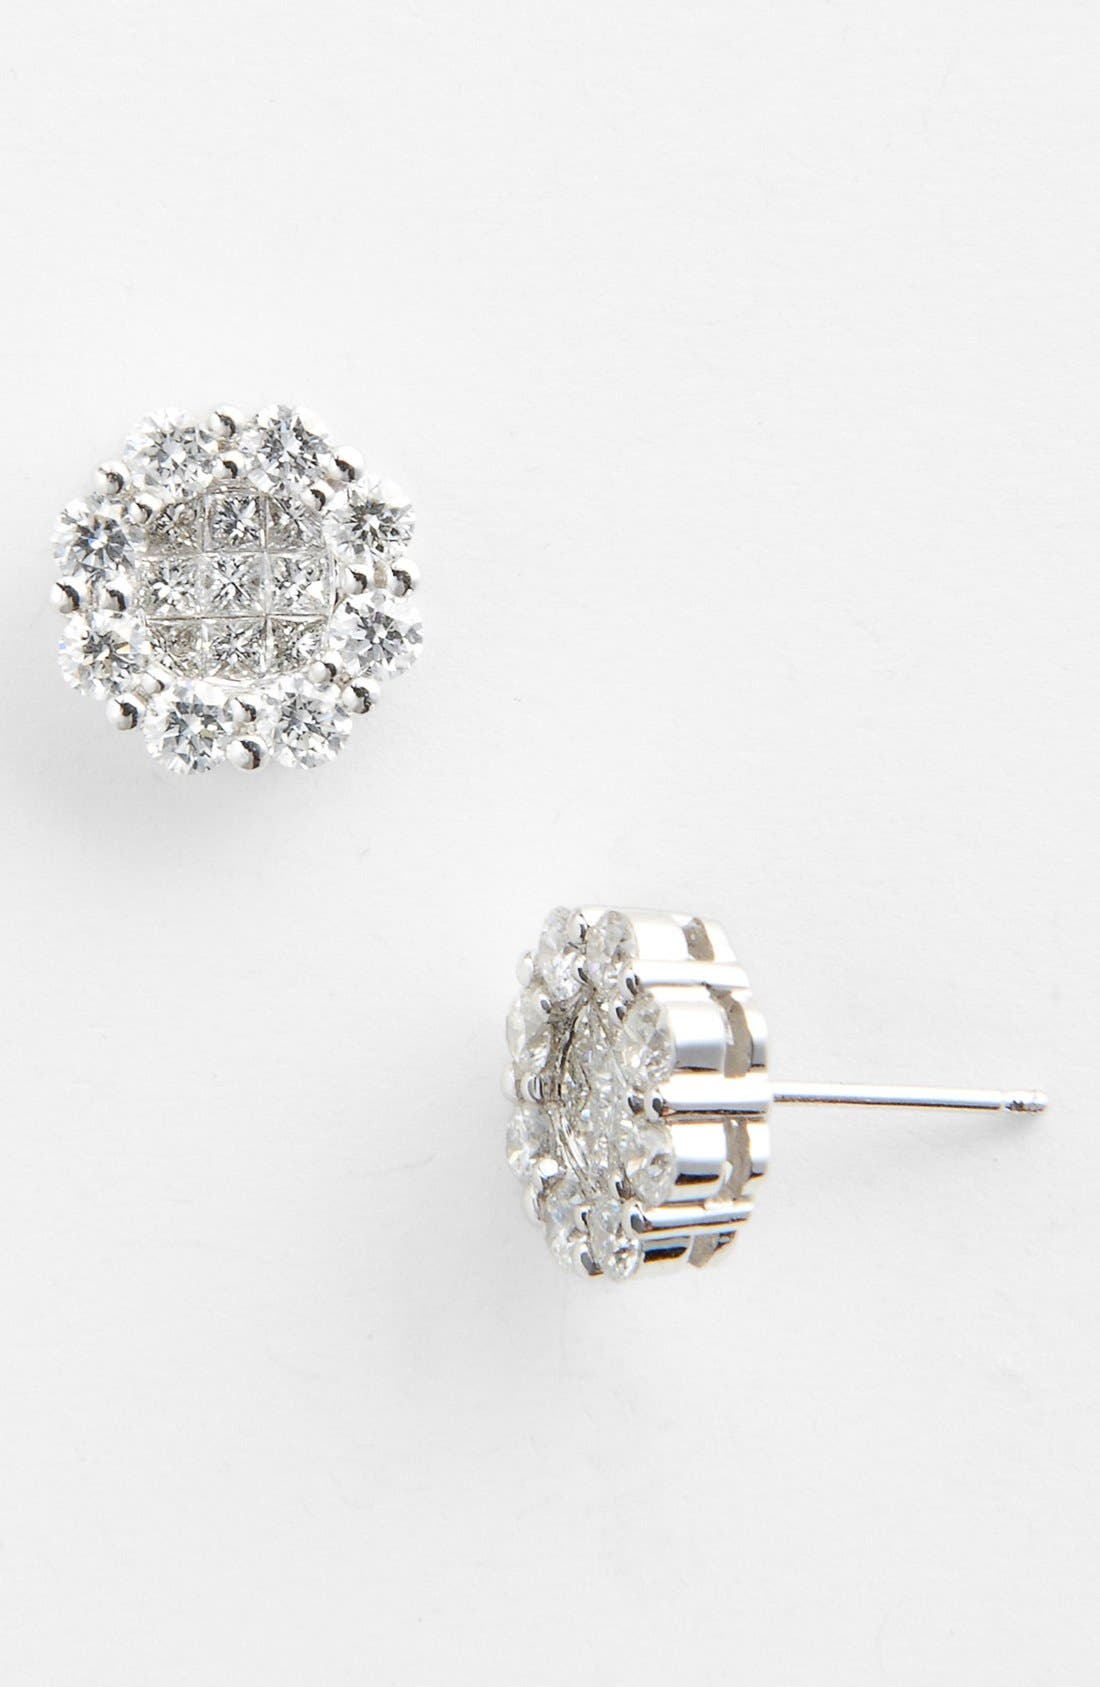 Alternate Image 1 Selected - Bony Levy Flower Diamond Earrings (Nordstrom Exclusive)